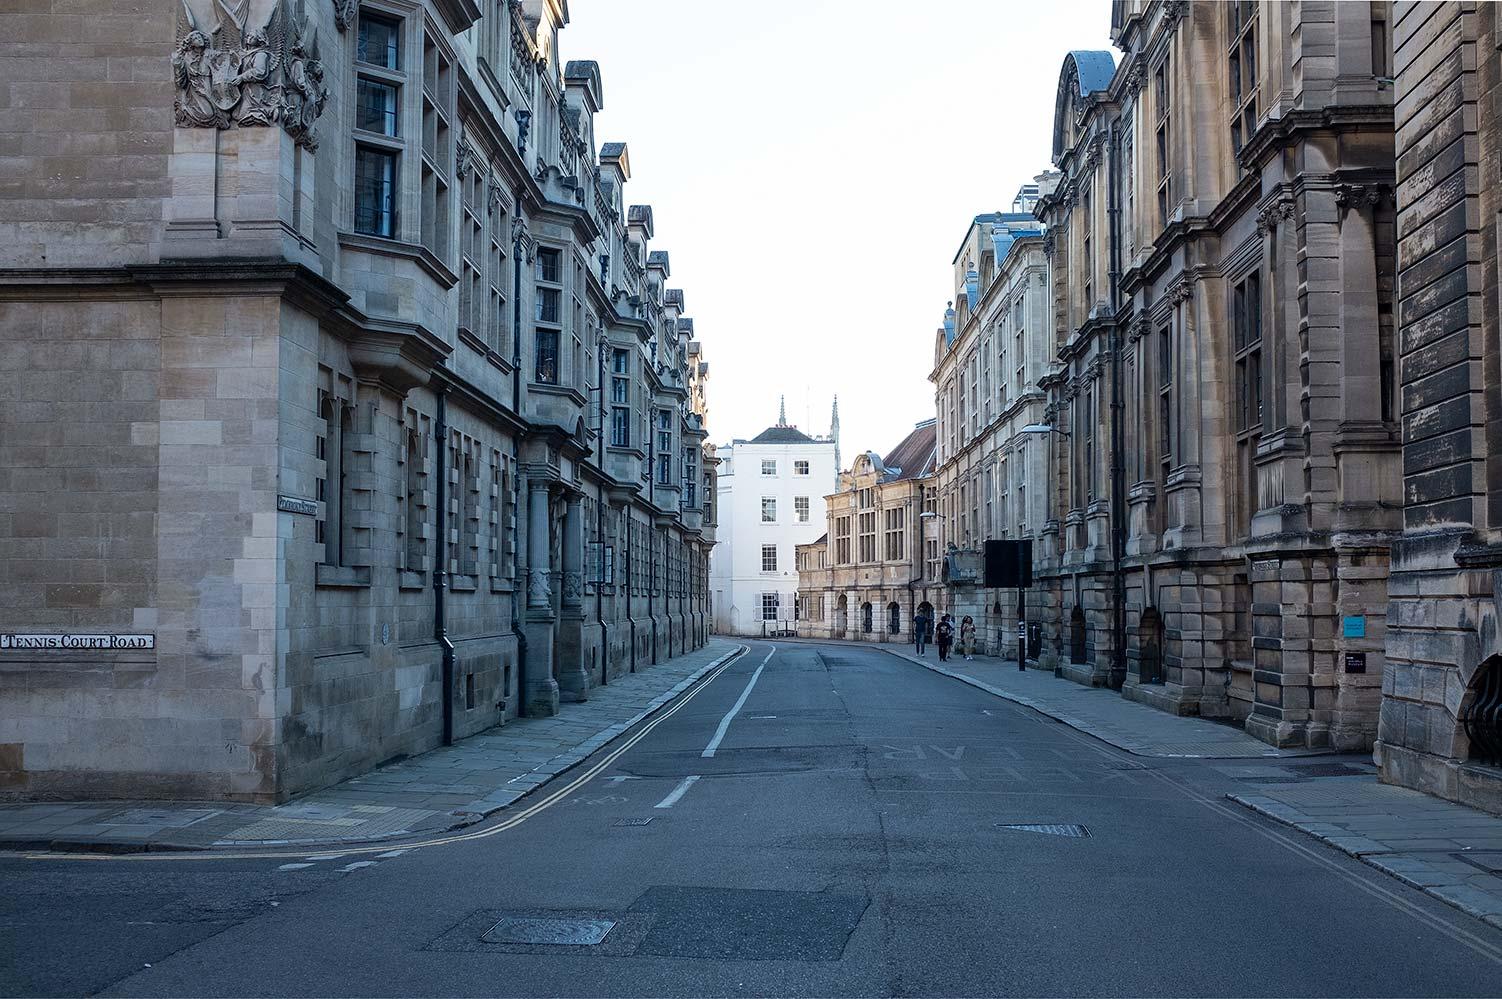 Downing Street Cambridge, UK